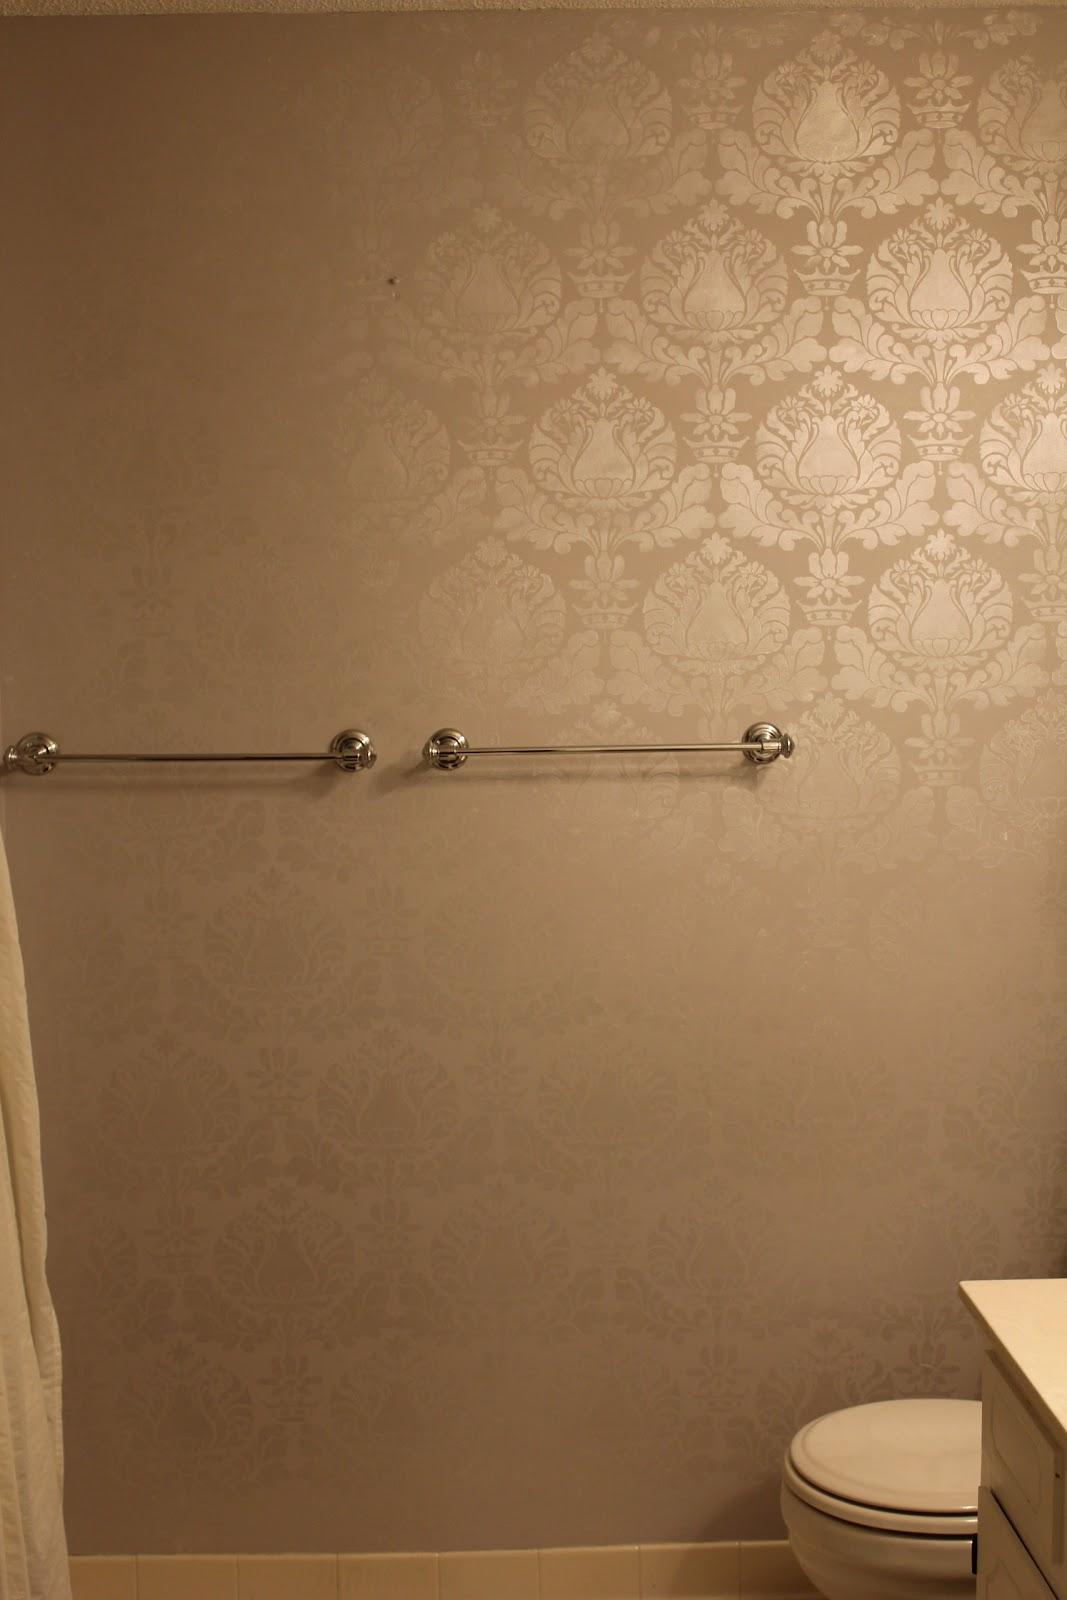 PeaHen Pad Guest Bathroom wall stencil